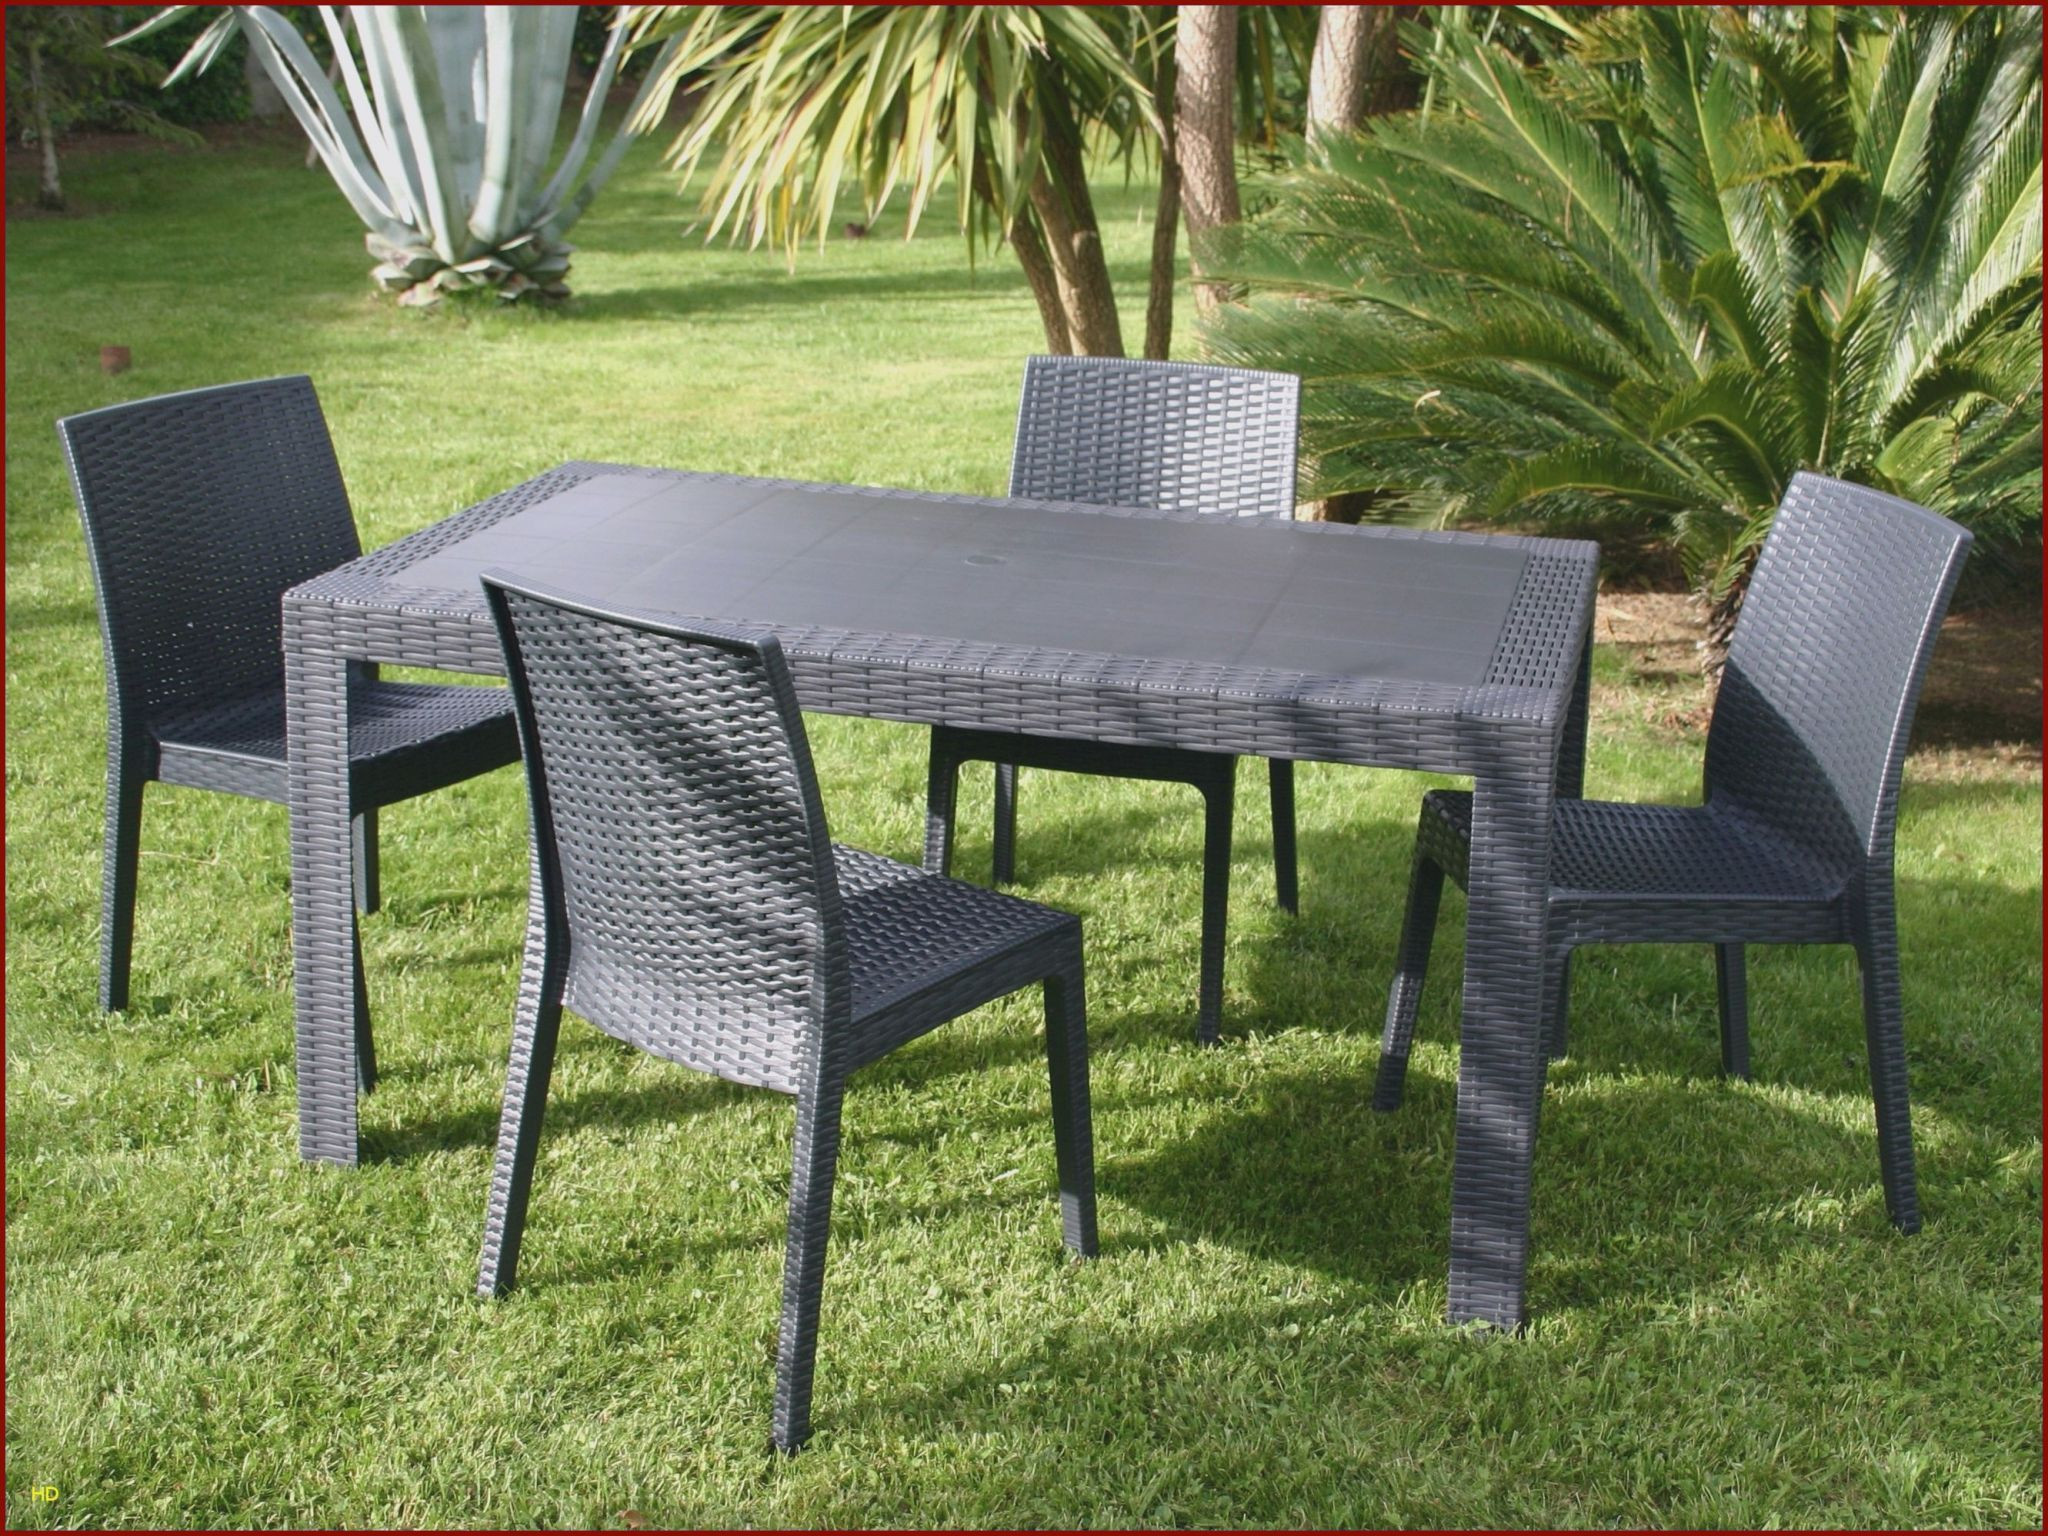 leclerc meuble catalogue chaises luxe chaise ice 0d table jardin resine lovely leclerc chaise of leclerc meuble catalogue